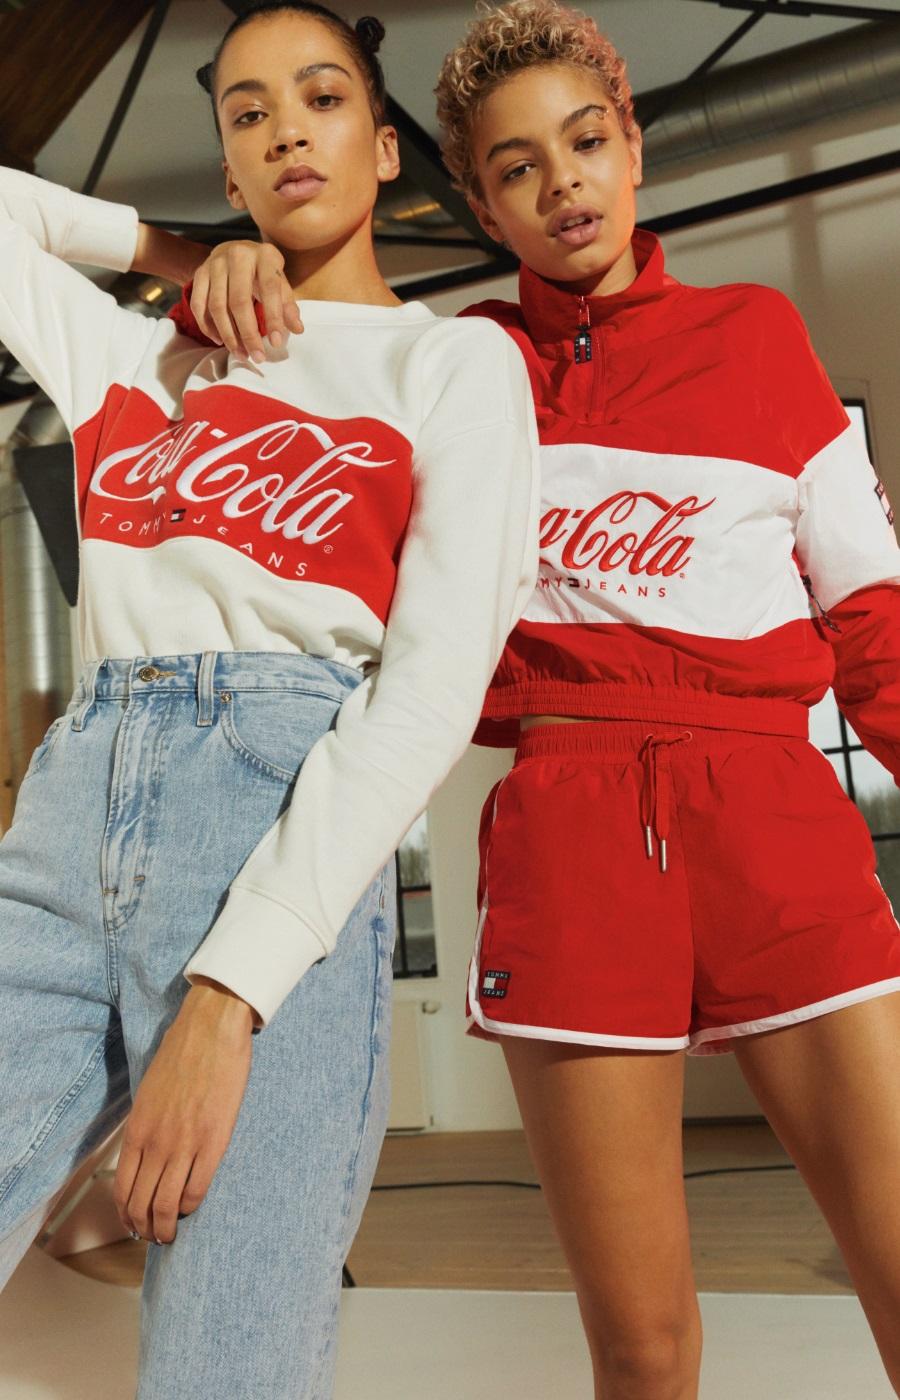 tommy-hilfiger-coca-cola-10